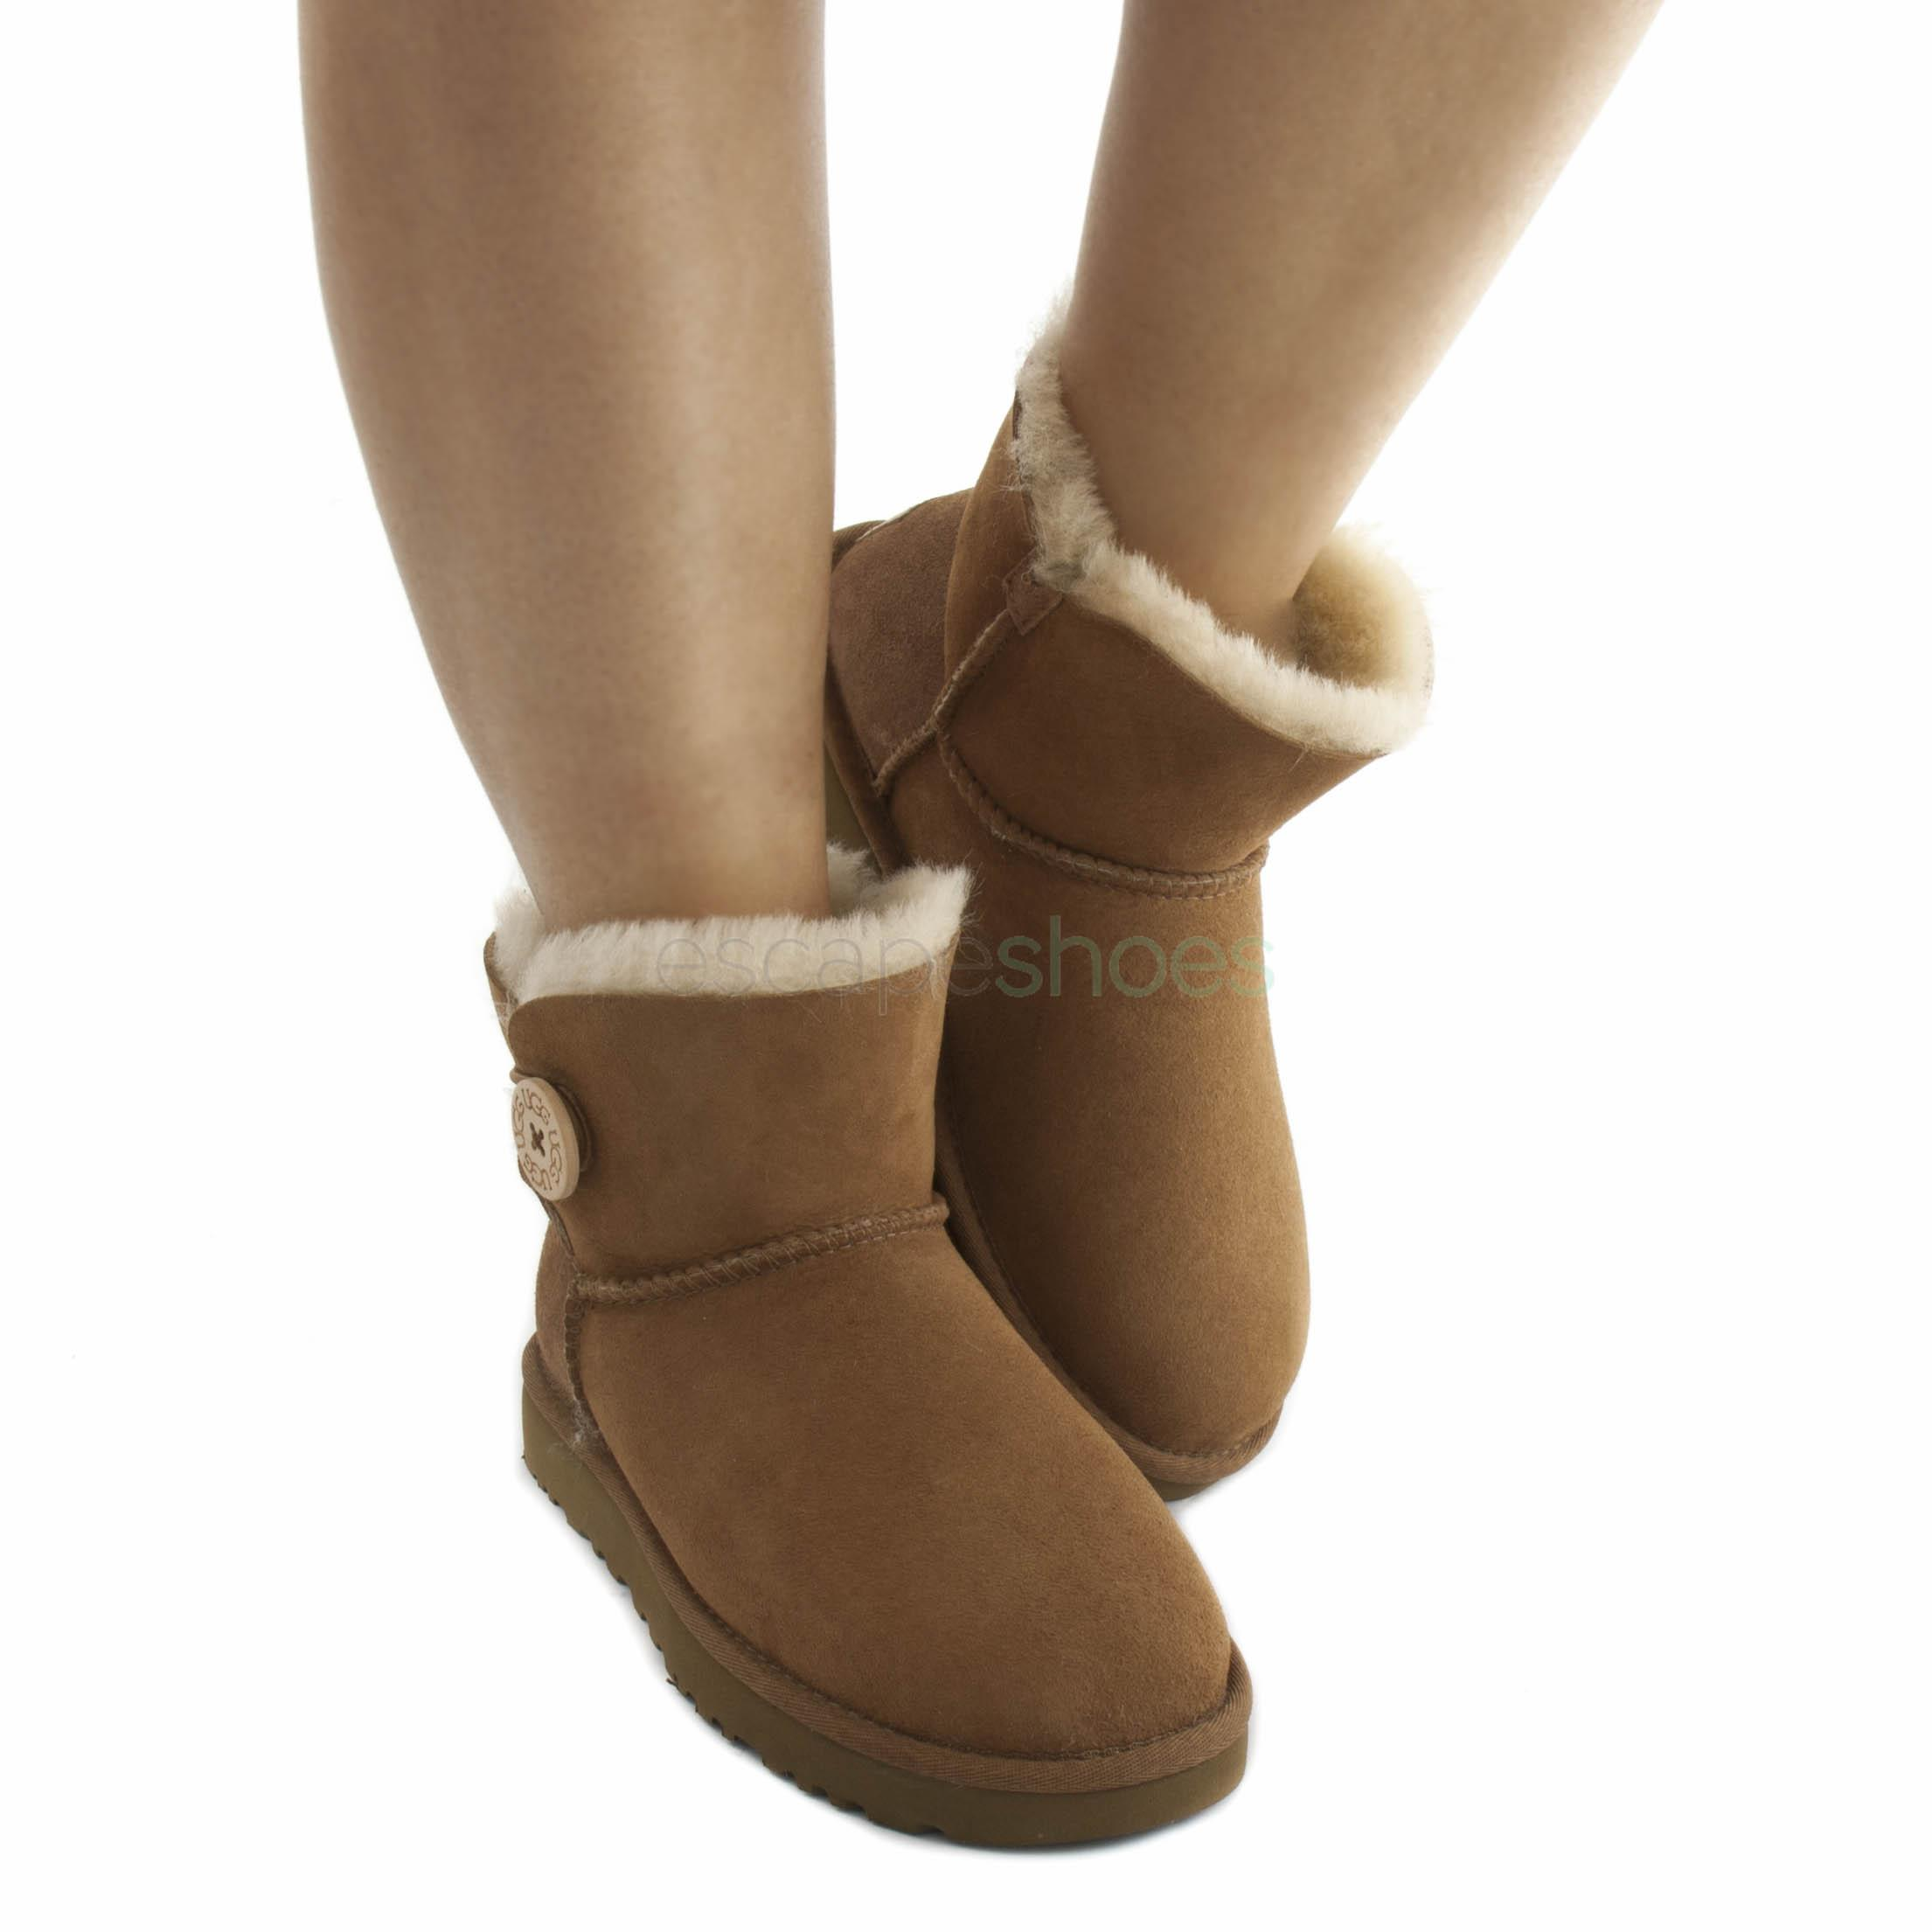 UGG Buckle Strap Chestnut Boots | ASOS